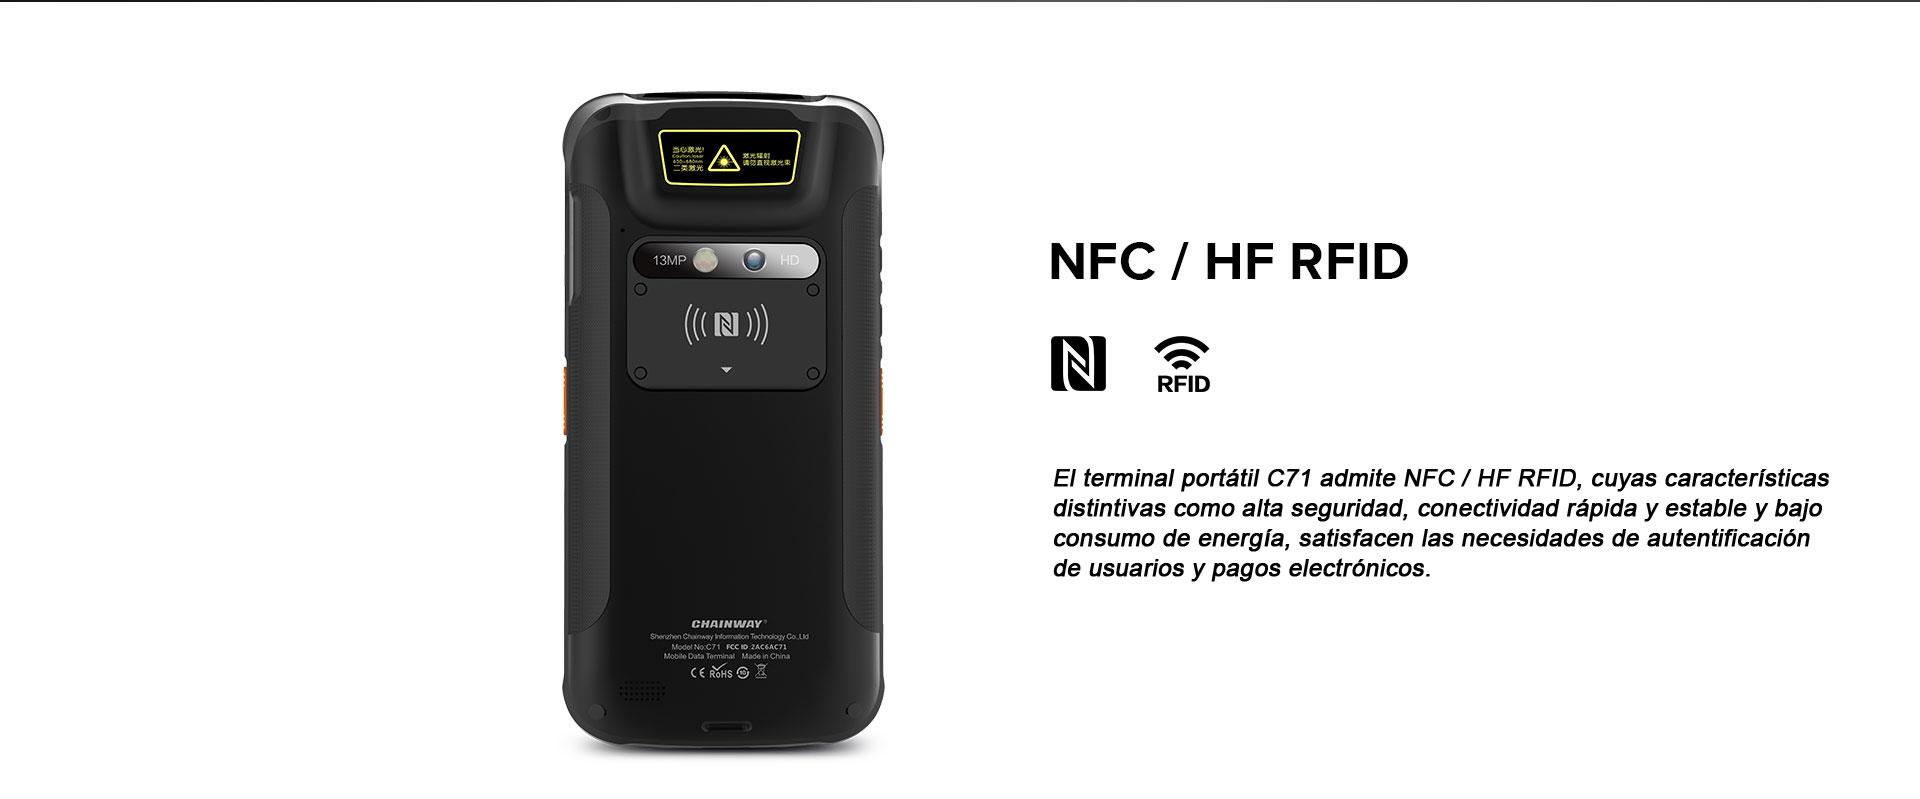 Terminal Portatil C71 CHAINWAY NFC